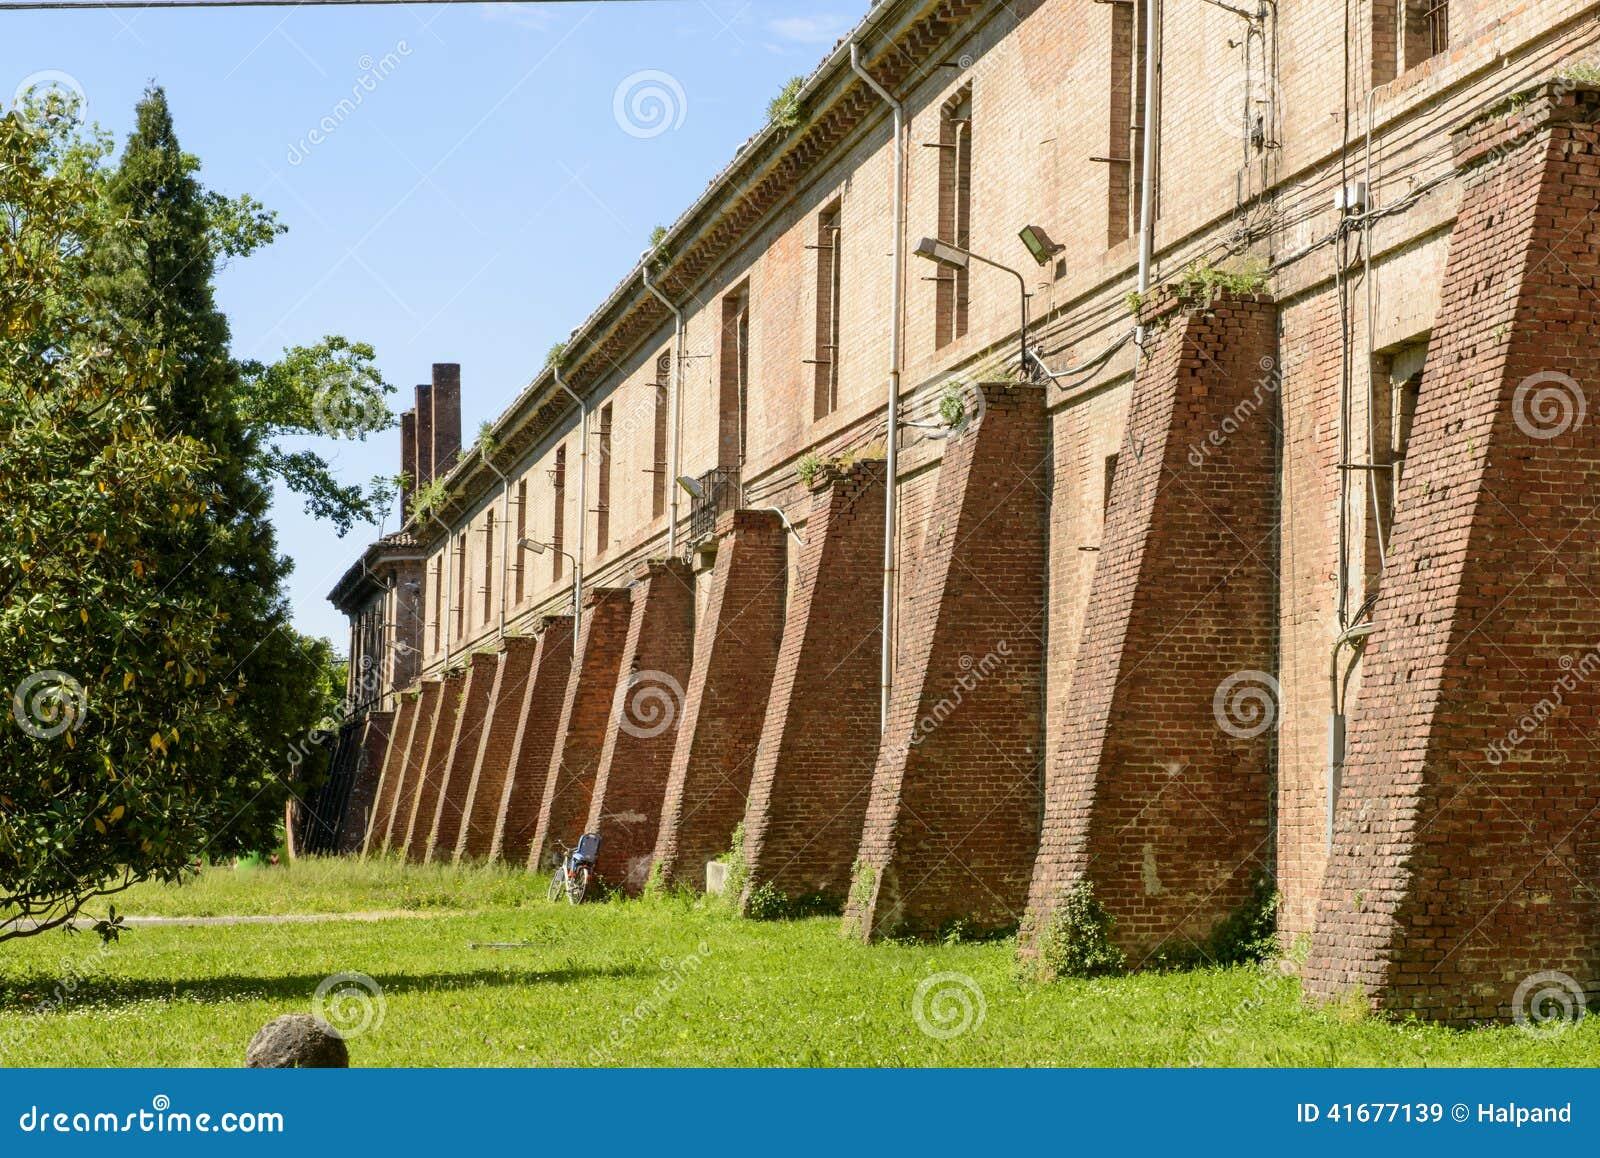 Old military building inside Cittadella, Alessandria, Italy